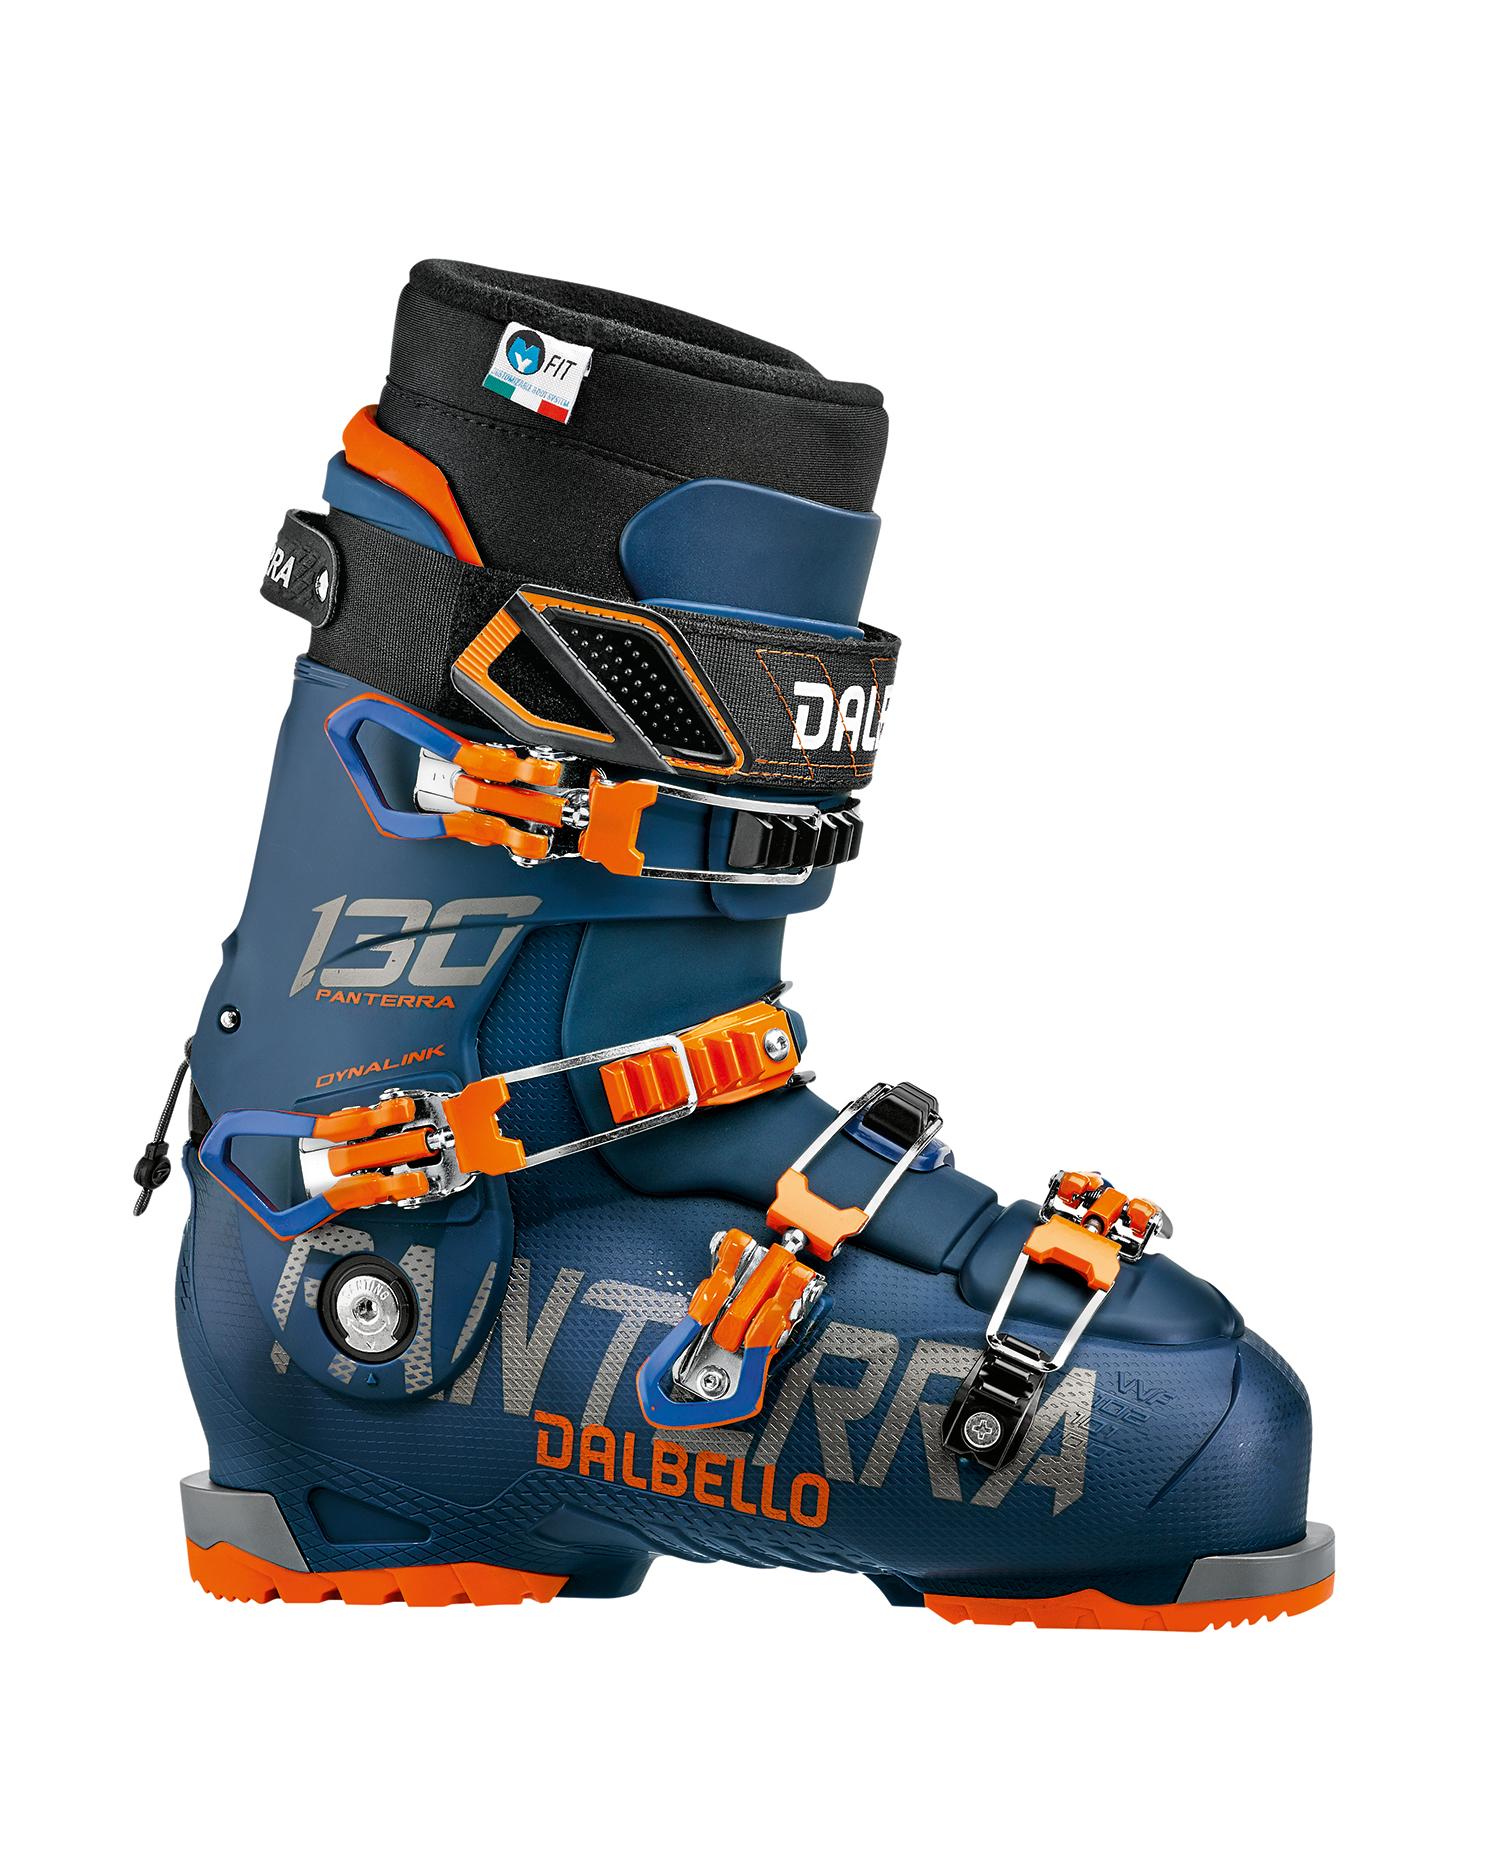 Lyžařské boty DALBELLO PANTERRA 130 ID MS